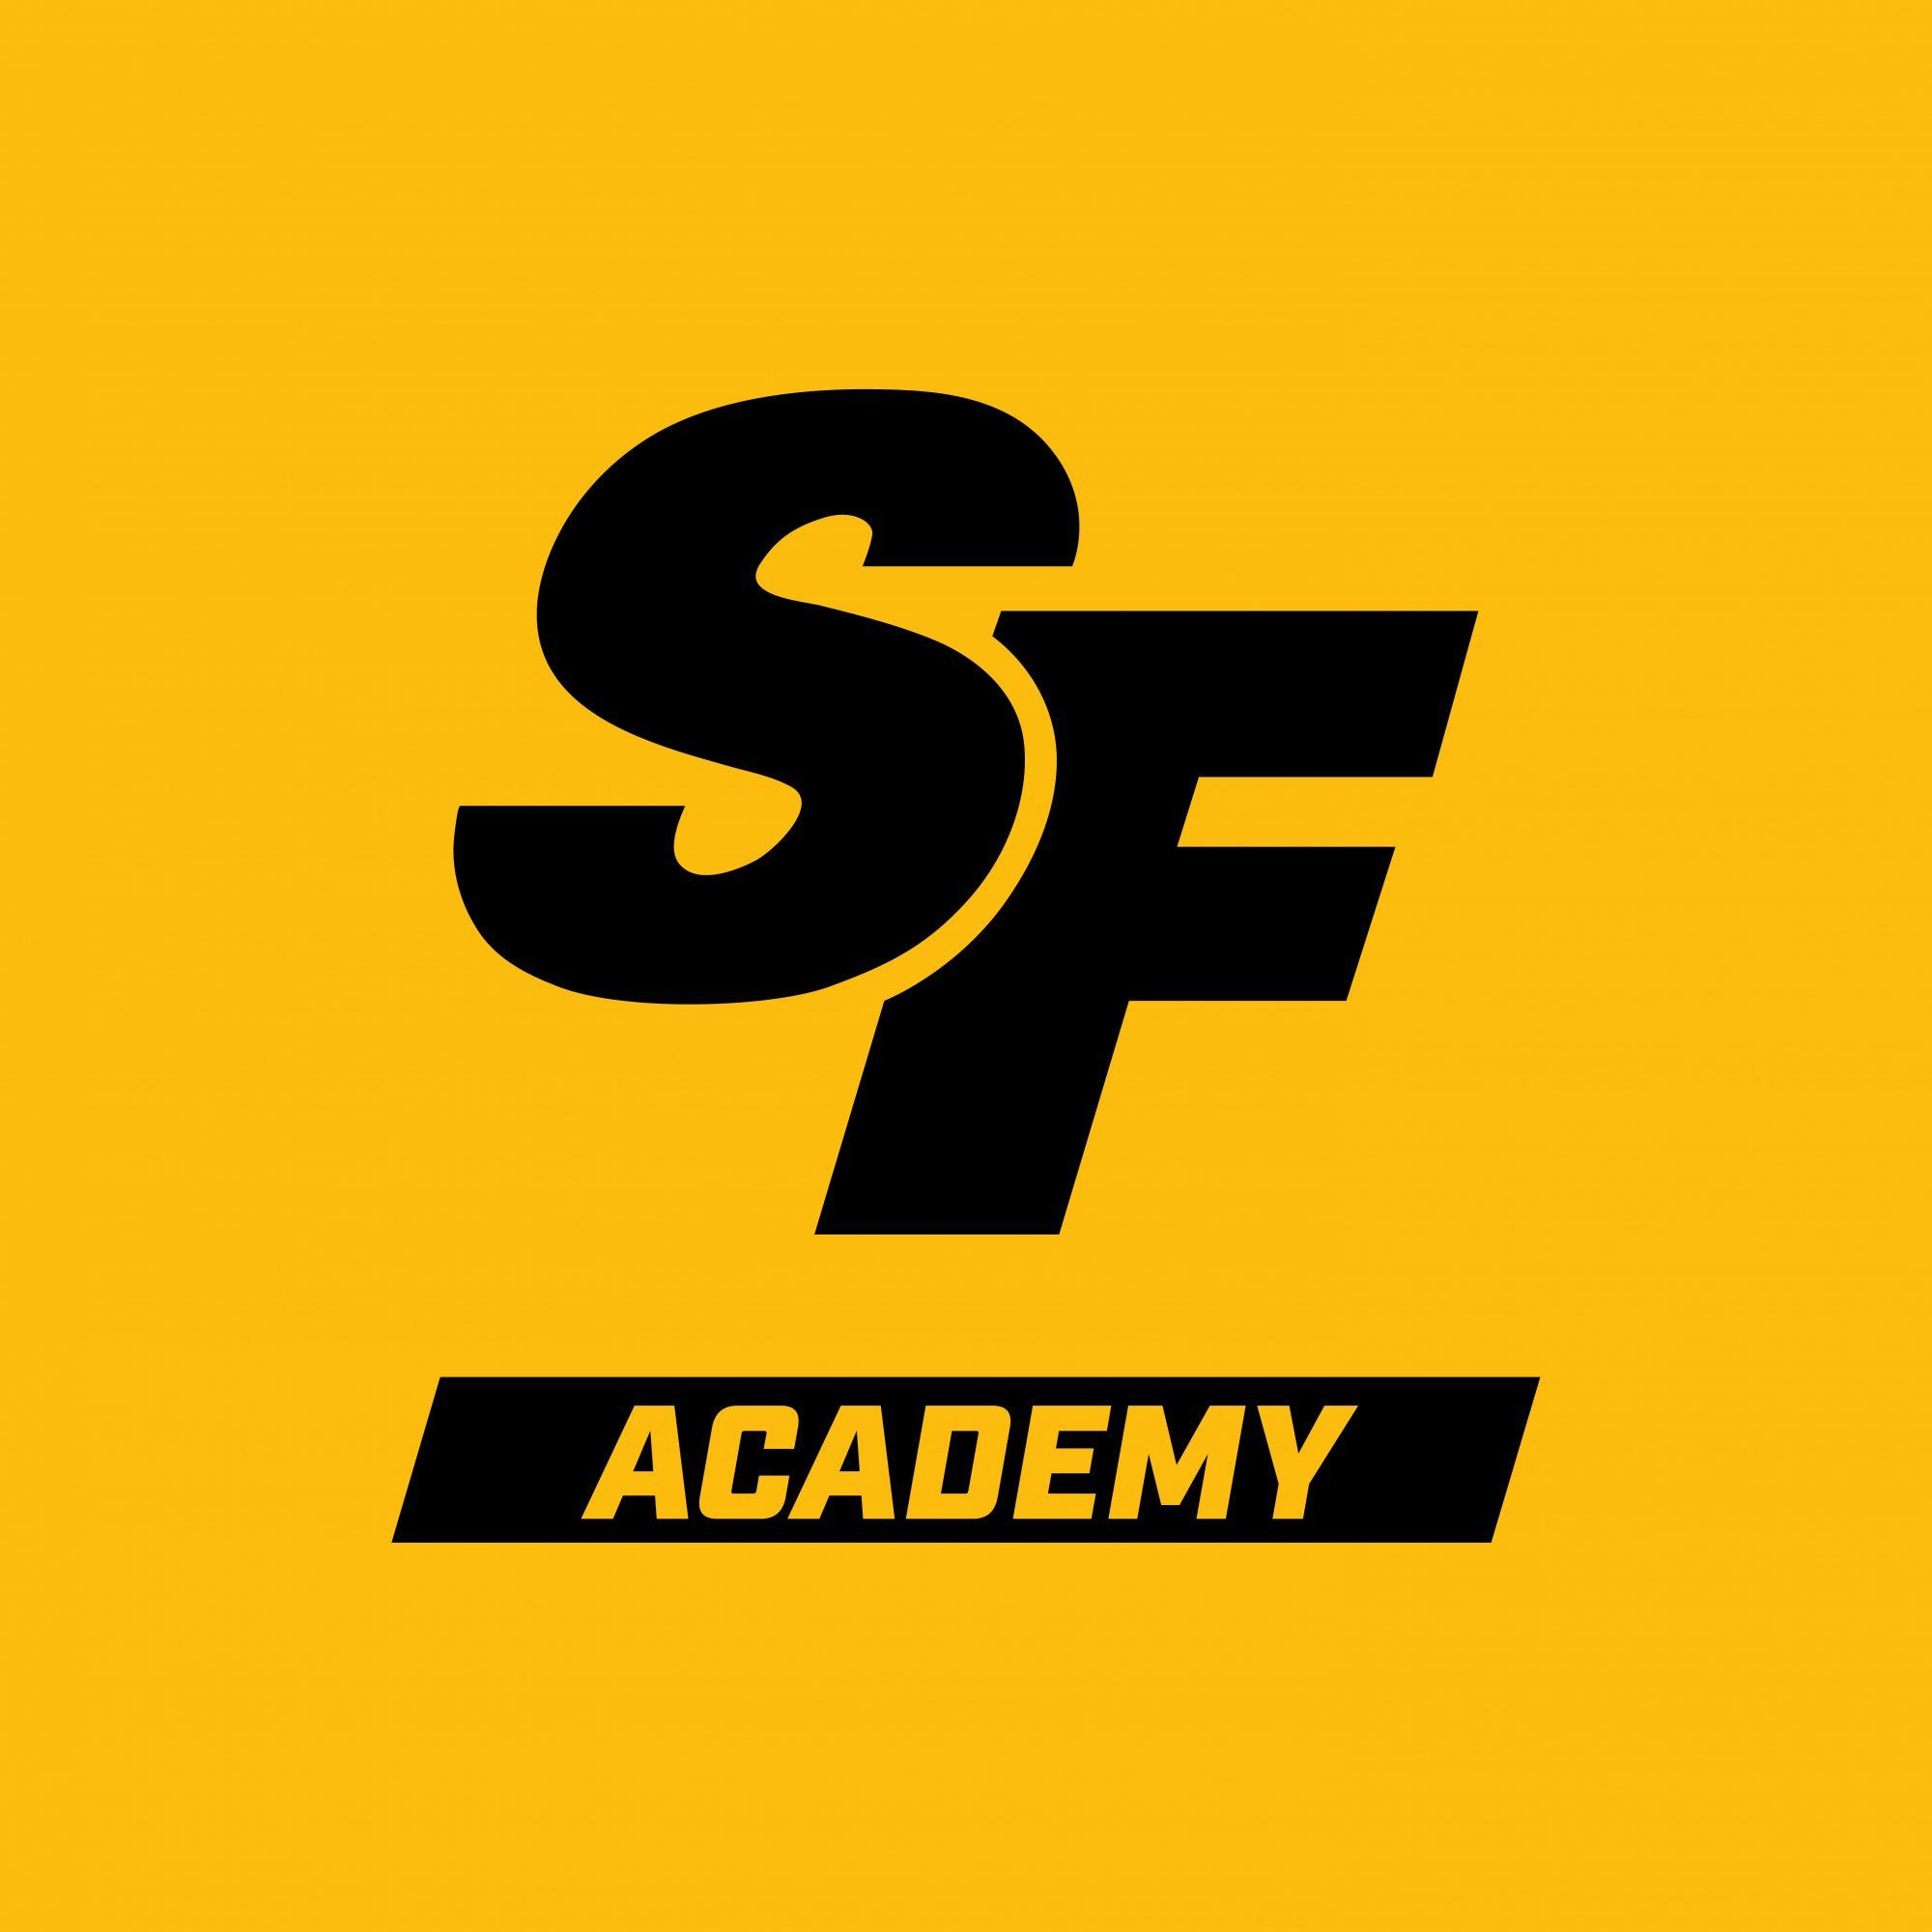 sf-academy-logo